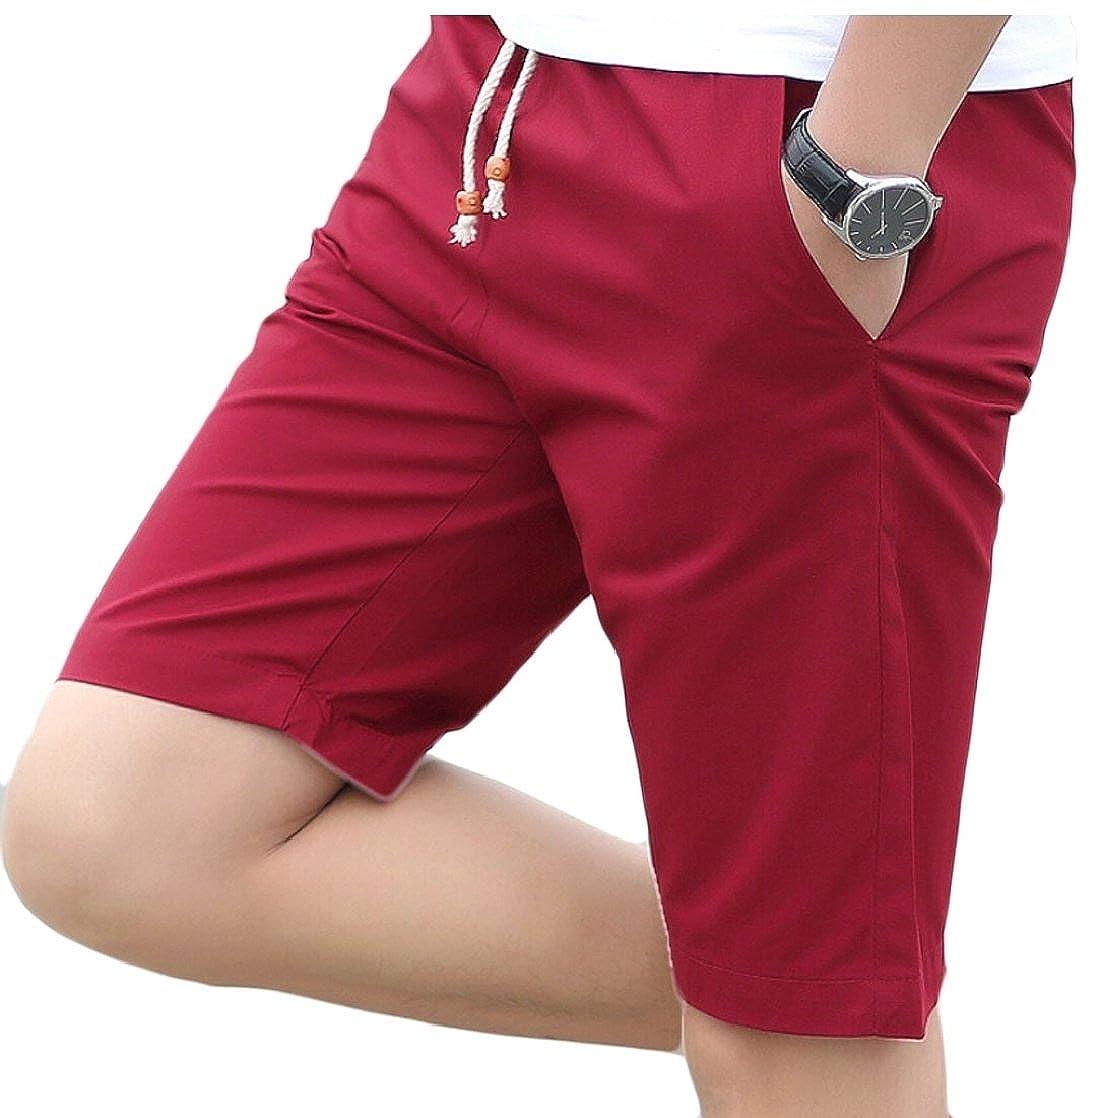 Gocgt Men's Cotton Sports Beach Elastic Waist Drawstring Shorts